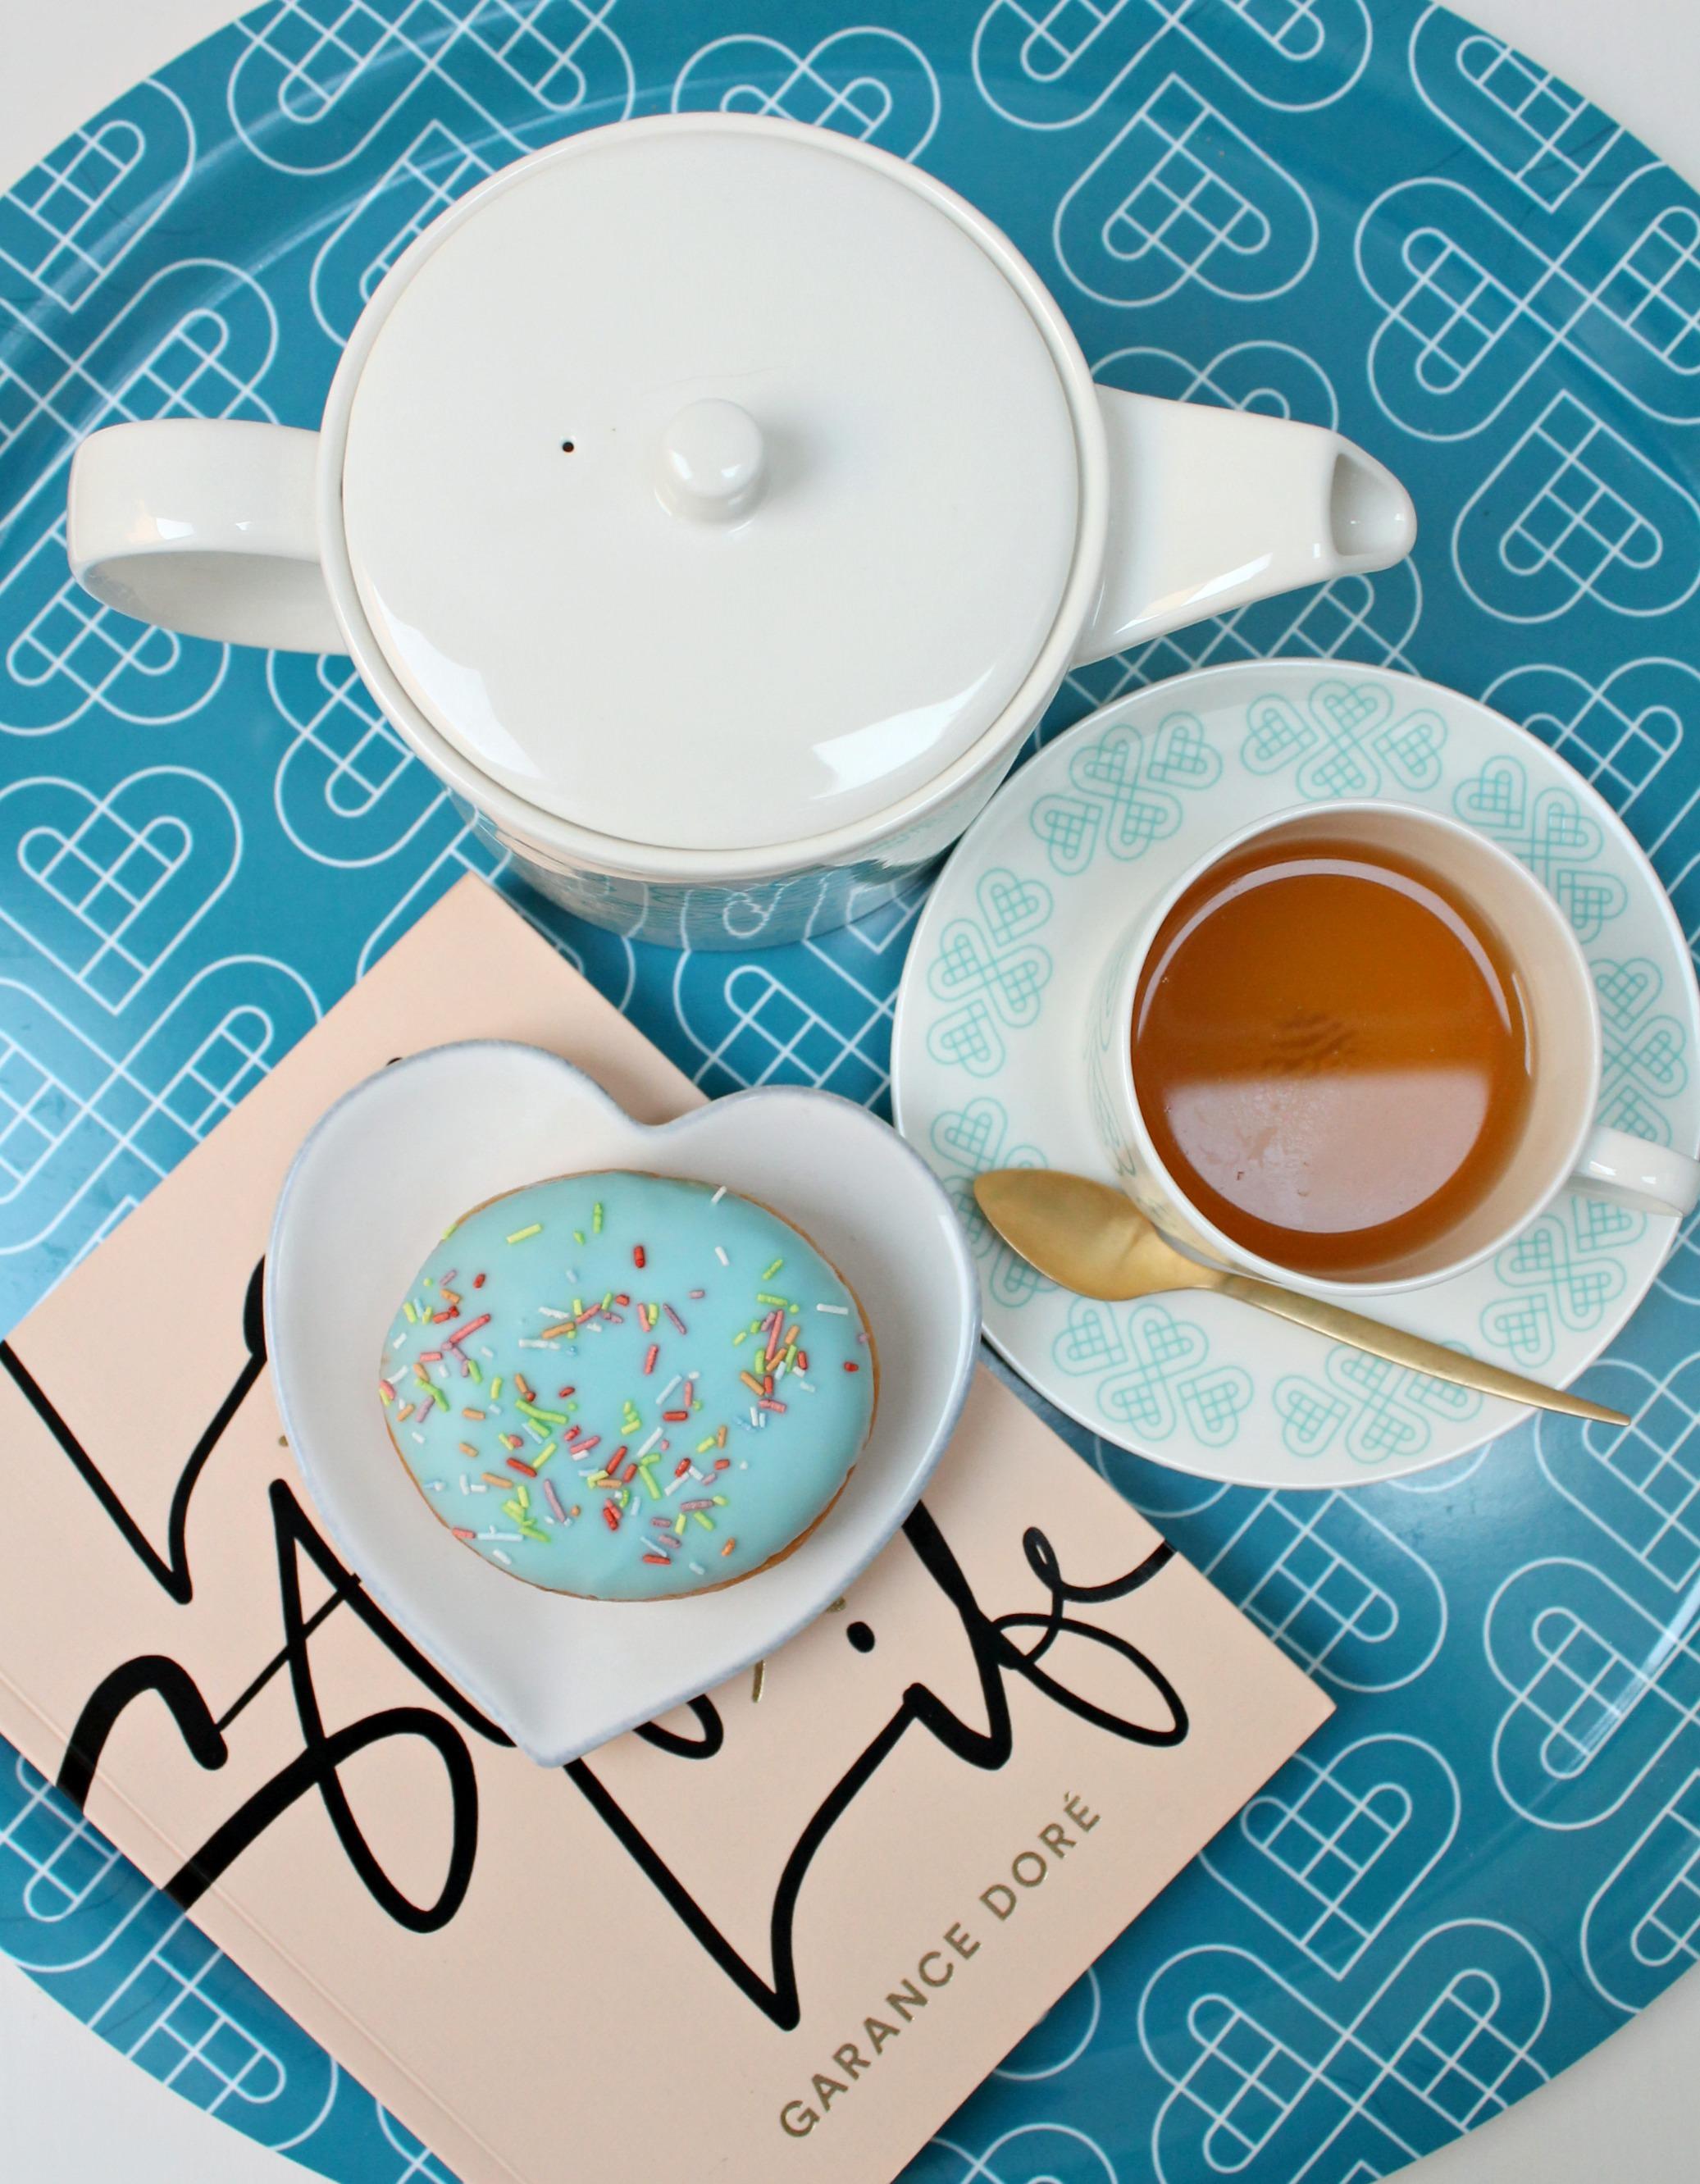 Cordello-home-tea-set-photo-by-Little-Big-Bell